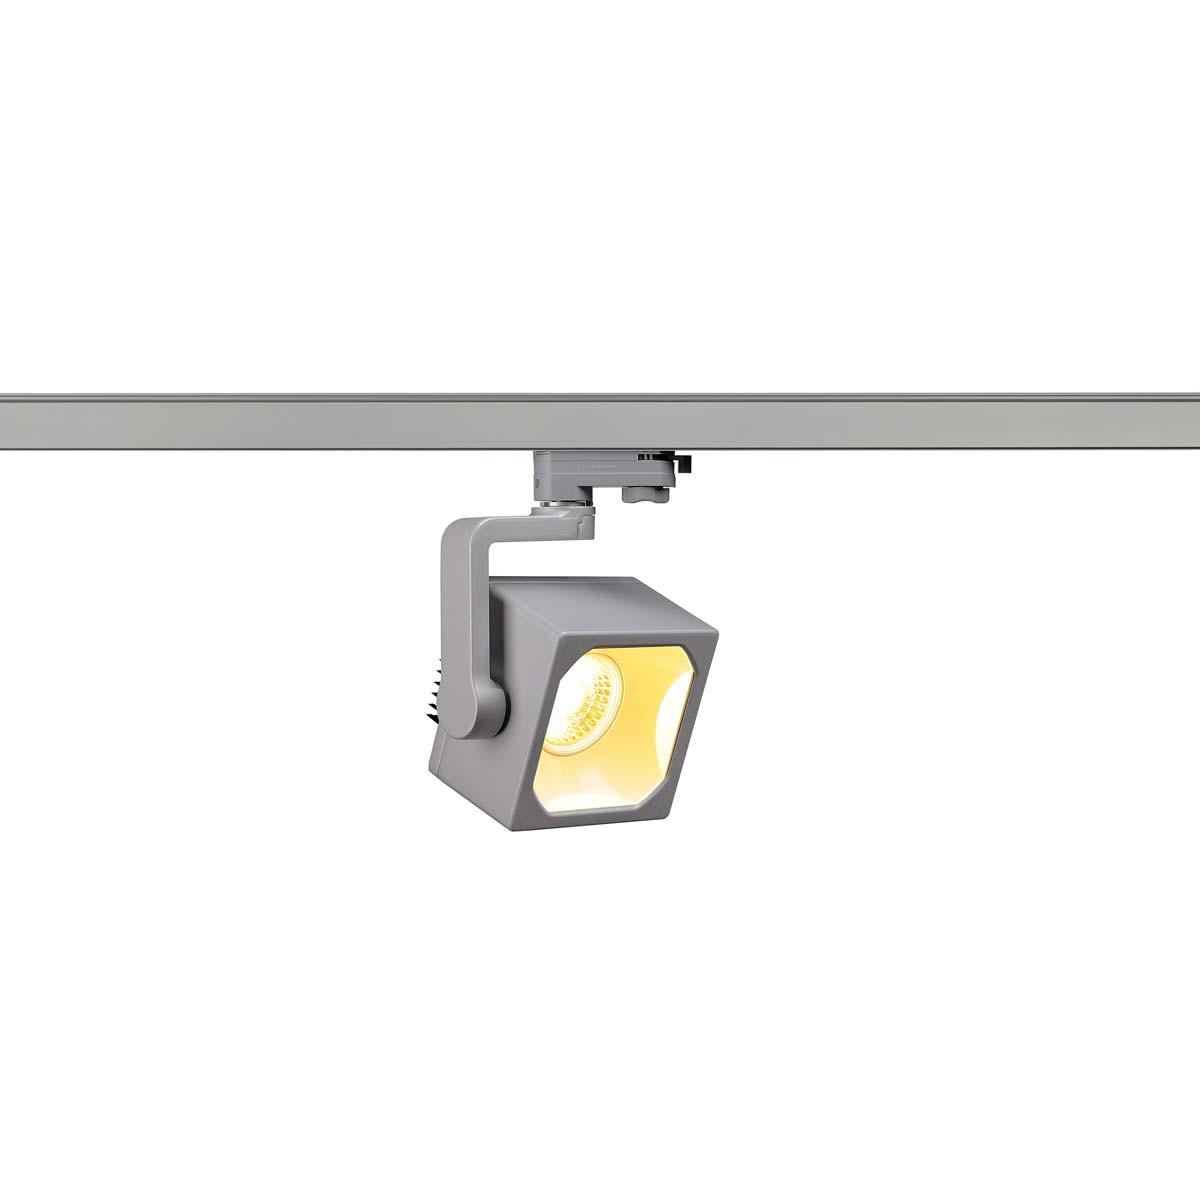 SLV 152744 Euro Cube Spot LED 28.5W 3000K Eutrac 3 Circuit Track Light Silver Grey